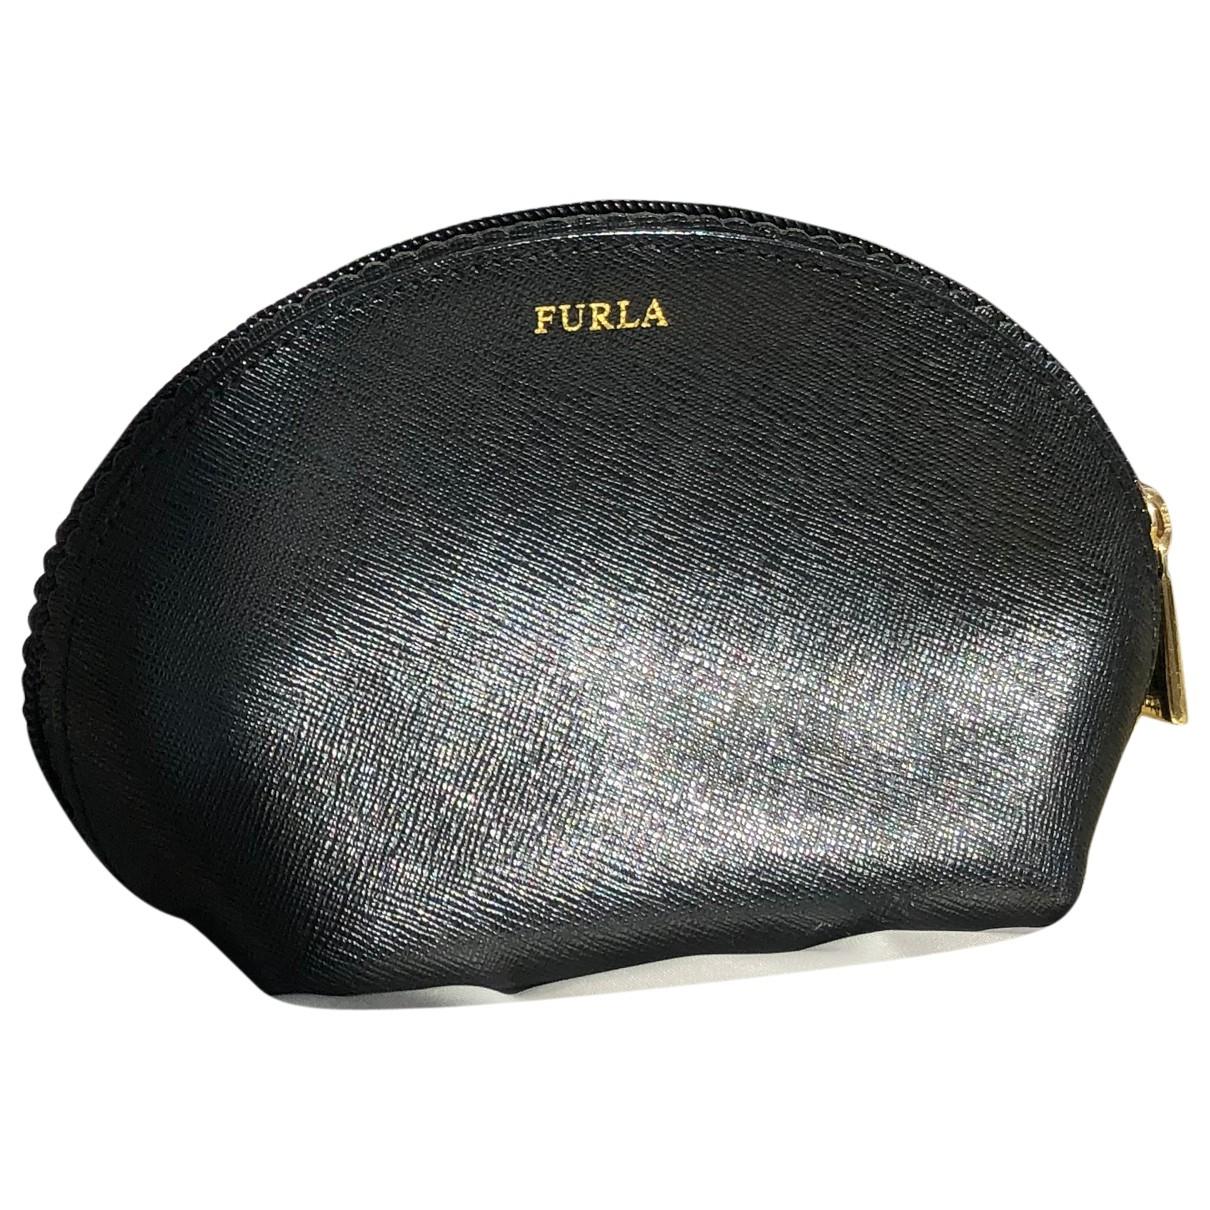 Furla \N Clutch in  Schwarz Leder